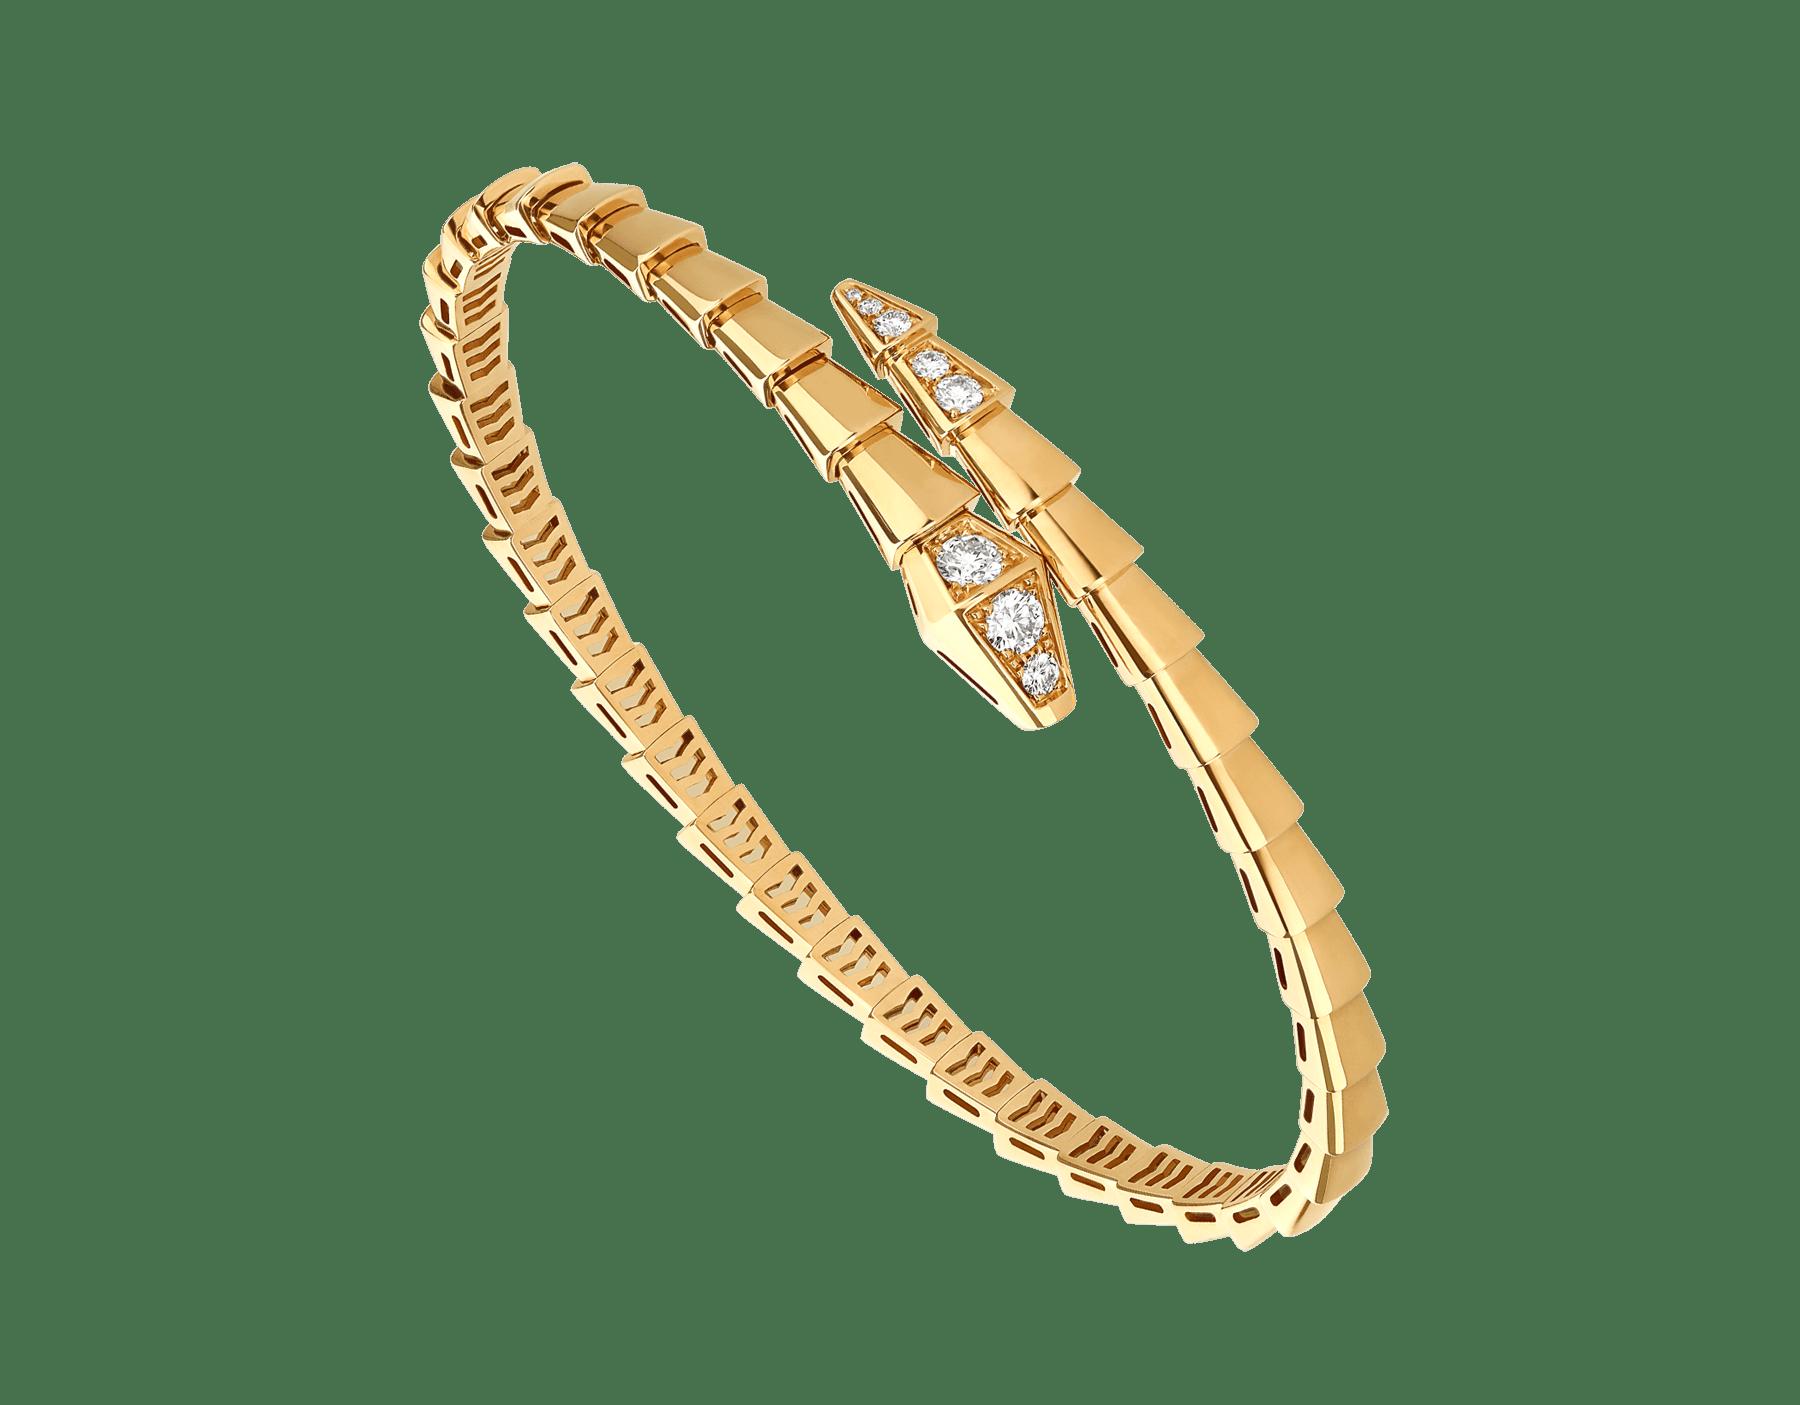 Serpenti Viper 18 kt yellow gold bracelet set with demi-pavé diamonds BR858972 image 1